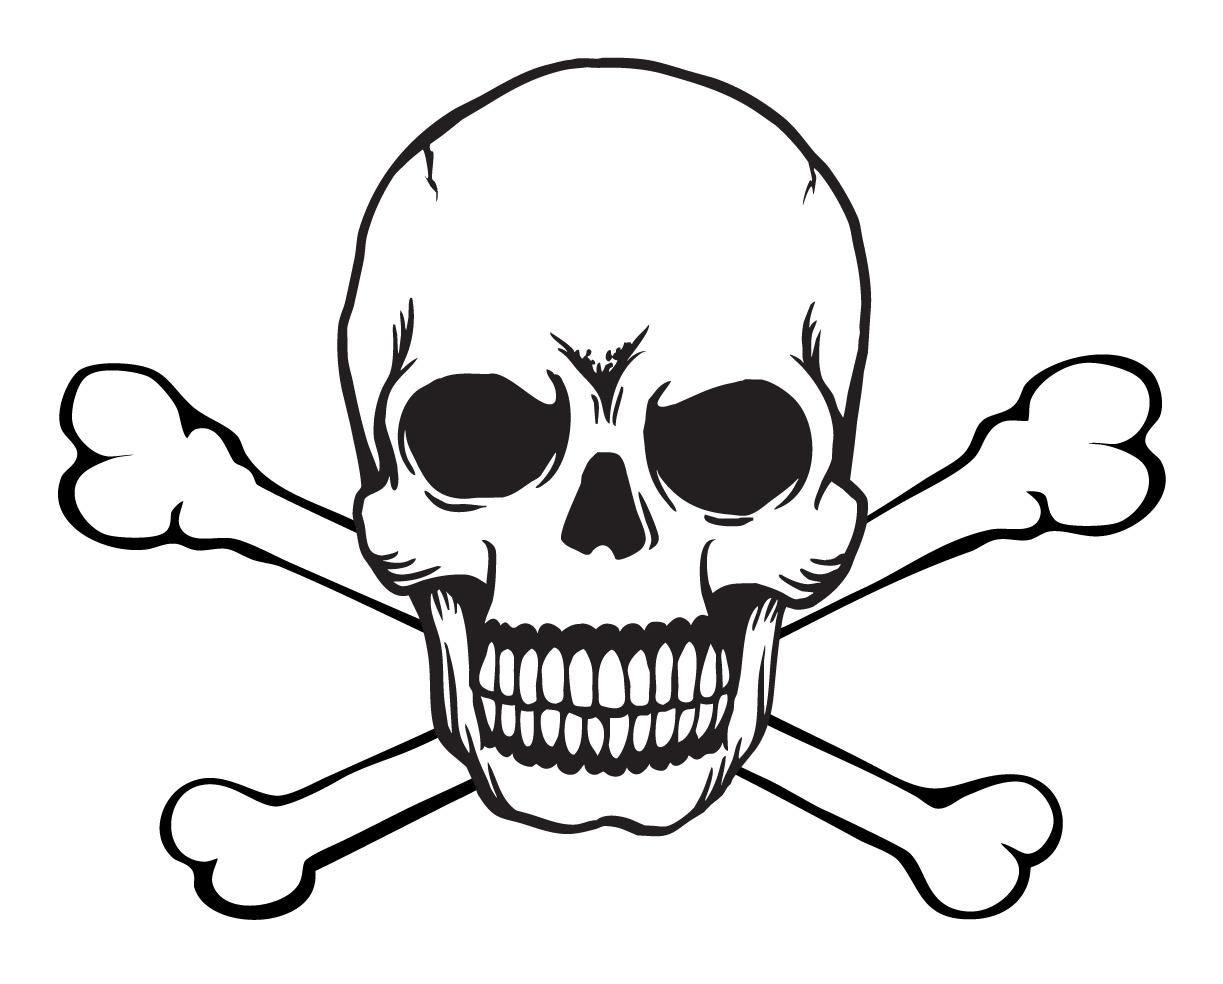 Free Vector Skull And Crossbones 133000 -Free Vector Skull And Crossbones 133000 Skull And Crossbones Jpg-3